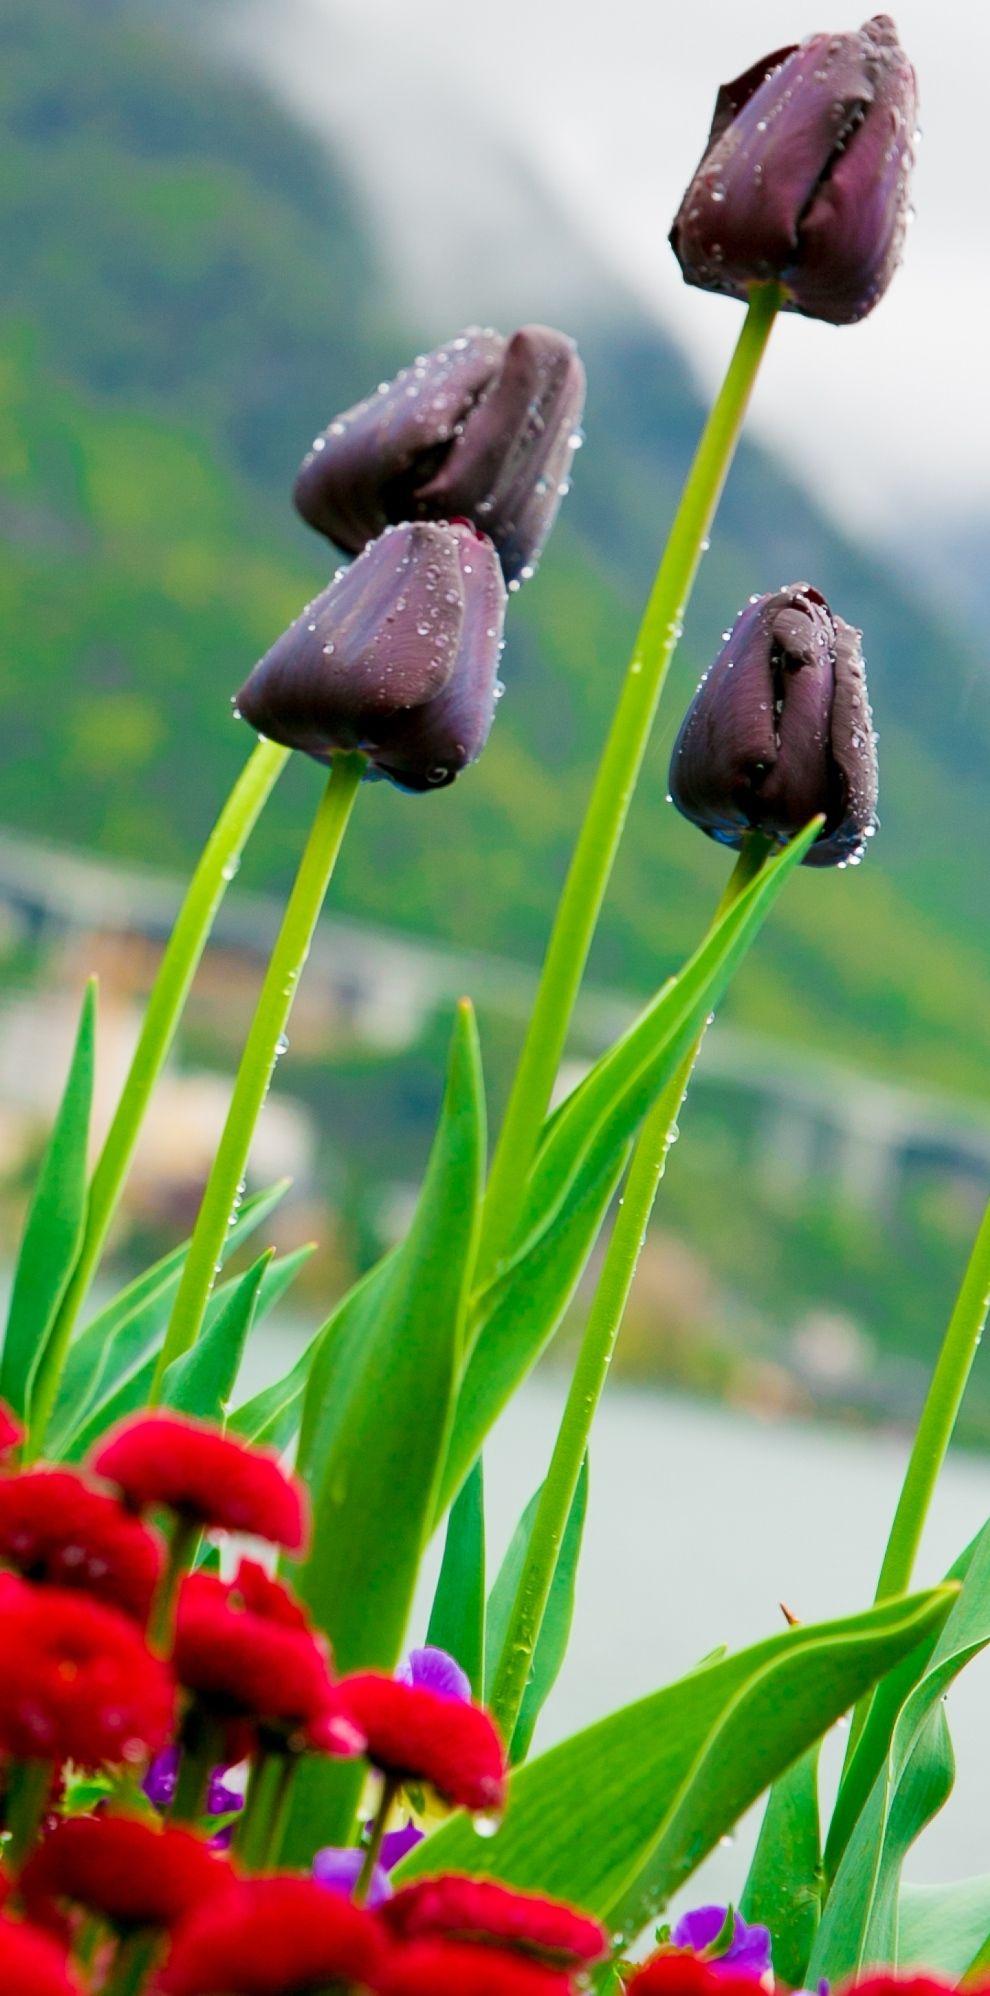 Black Tulips, Flowers on Lake Geneva, with Swiss Alps